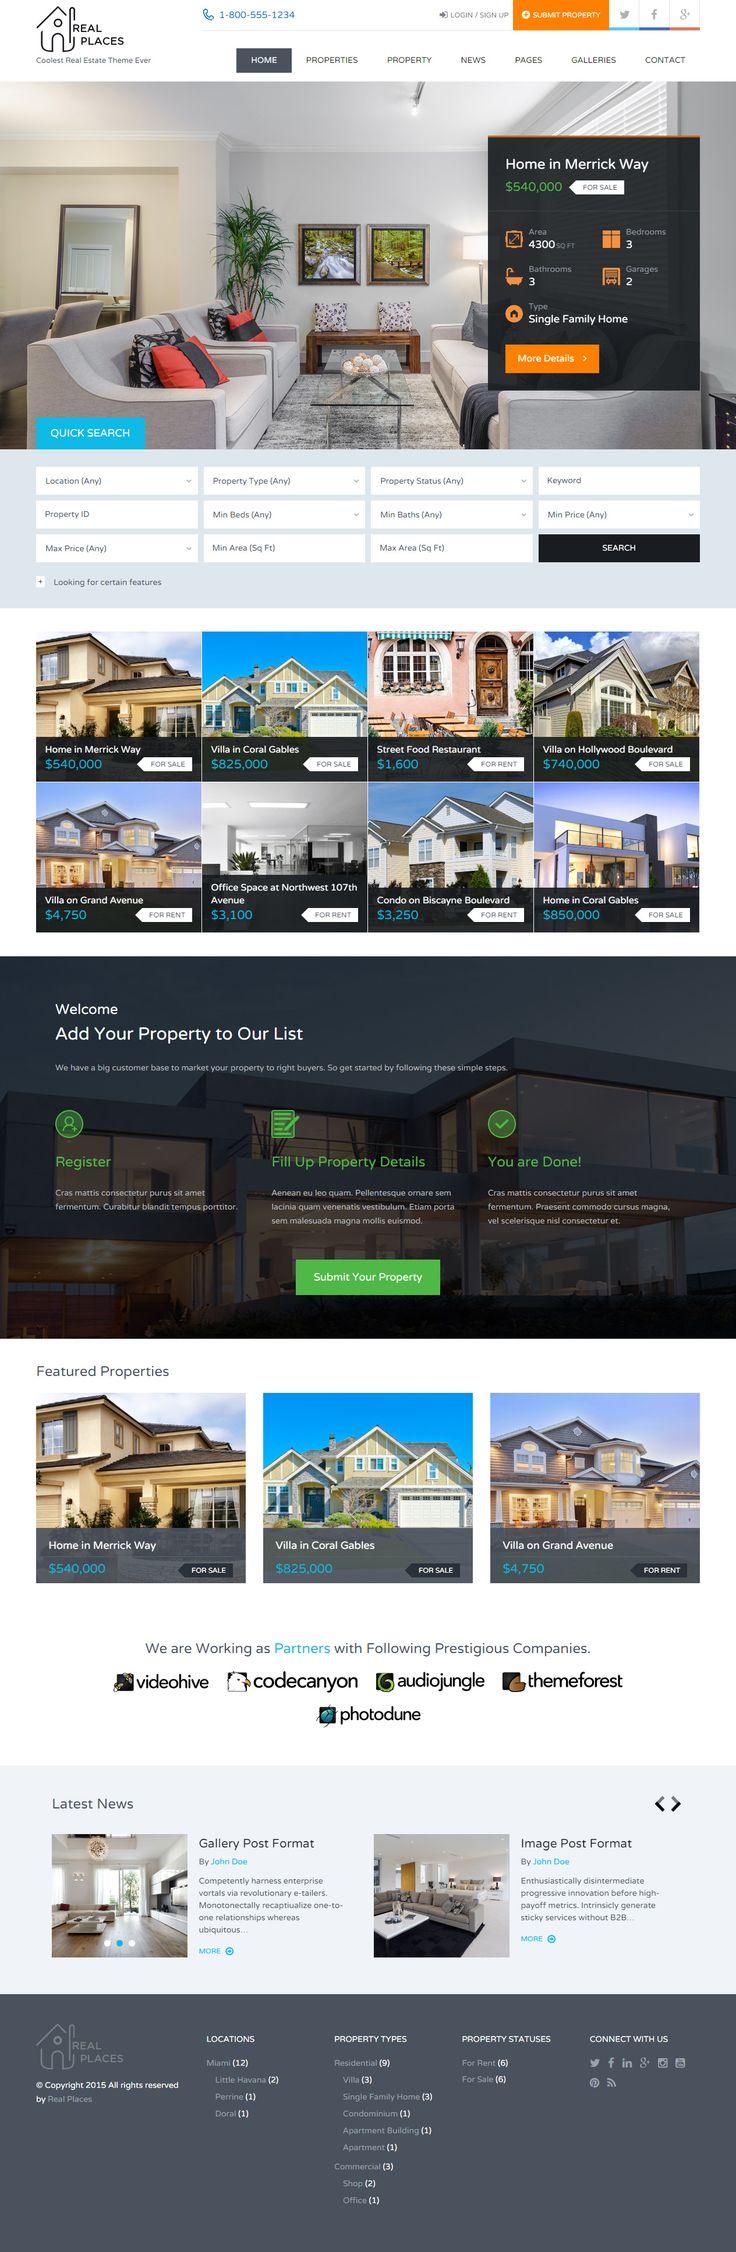 Real Places is Premium full Responsive Retina #WordPress #RealEstate #Theme…